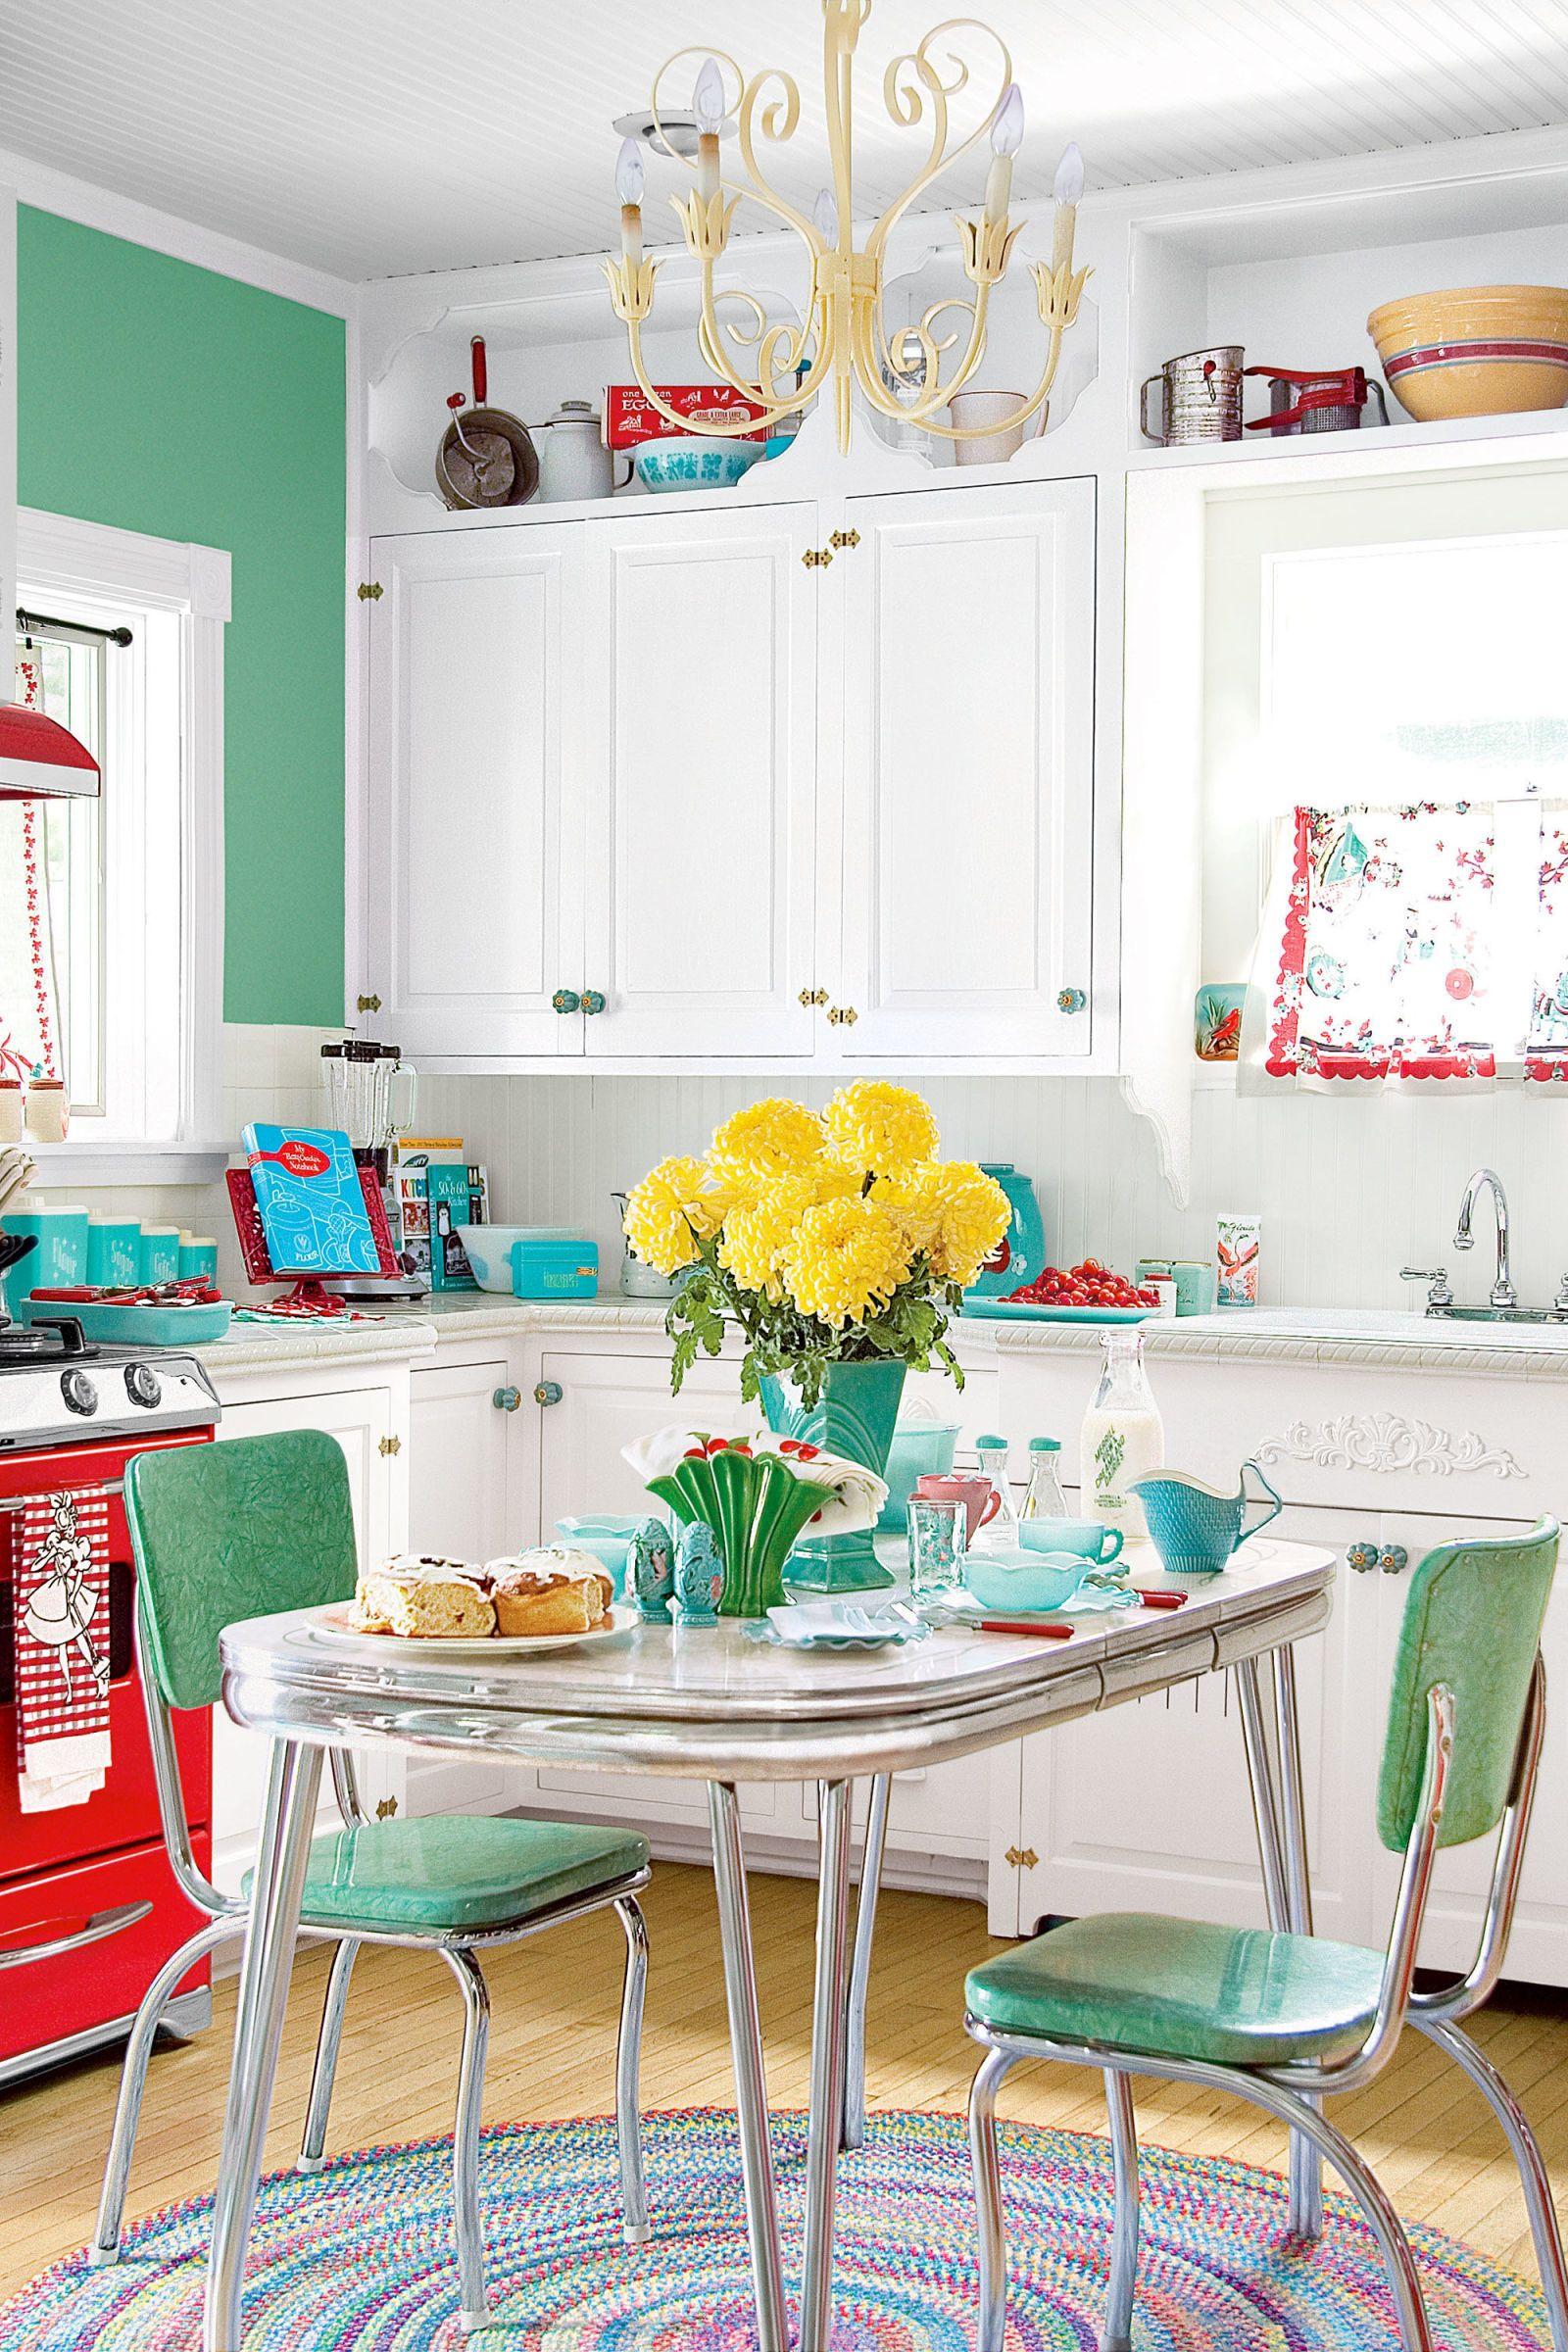 11 Retro Diner Decor Ideas For Your Kitchen